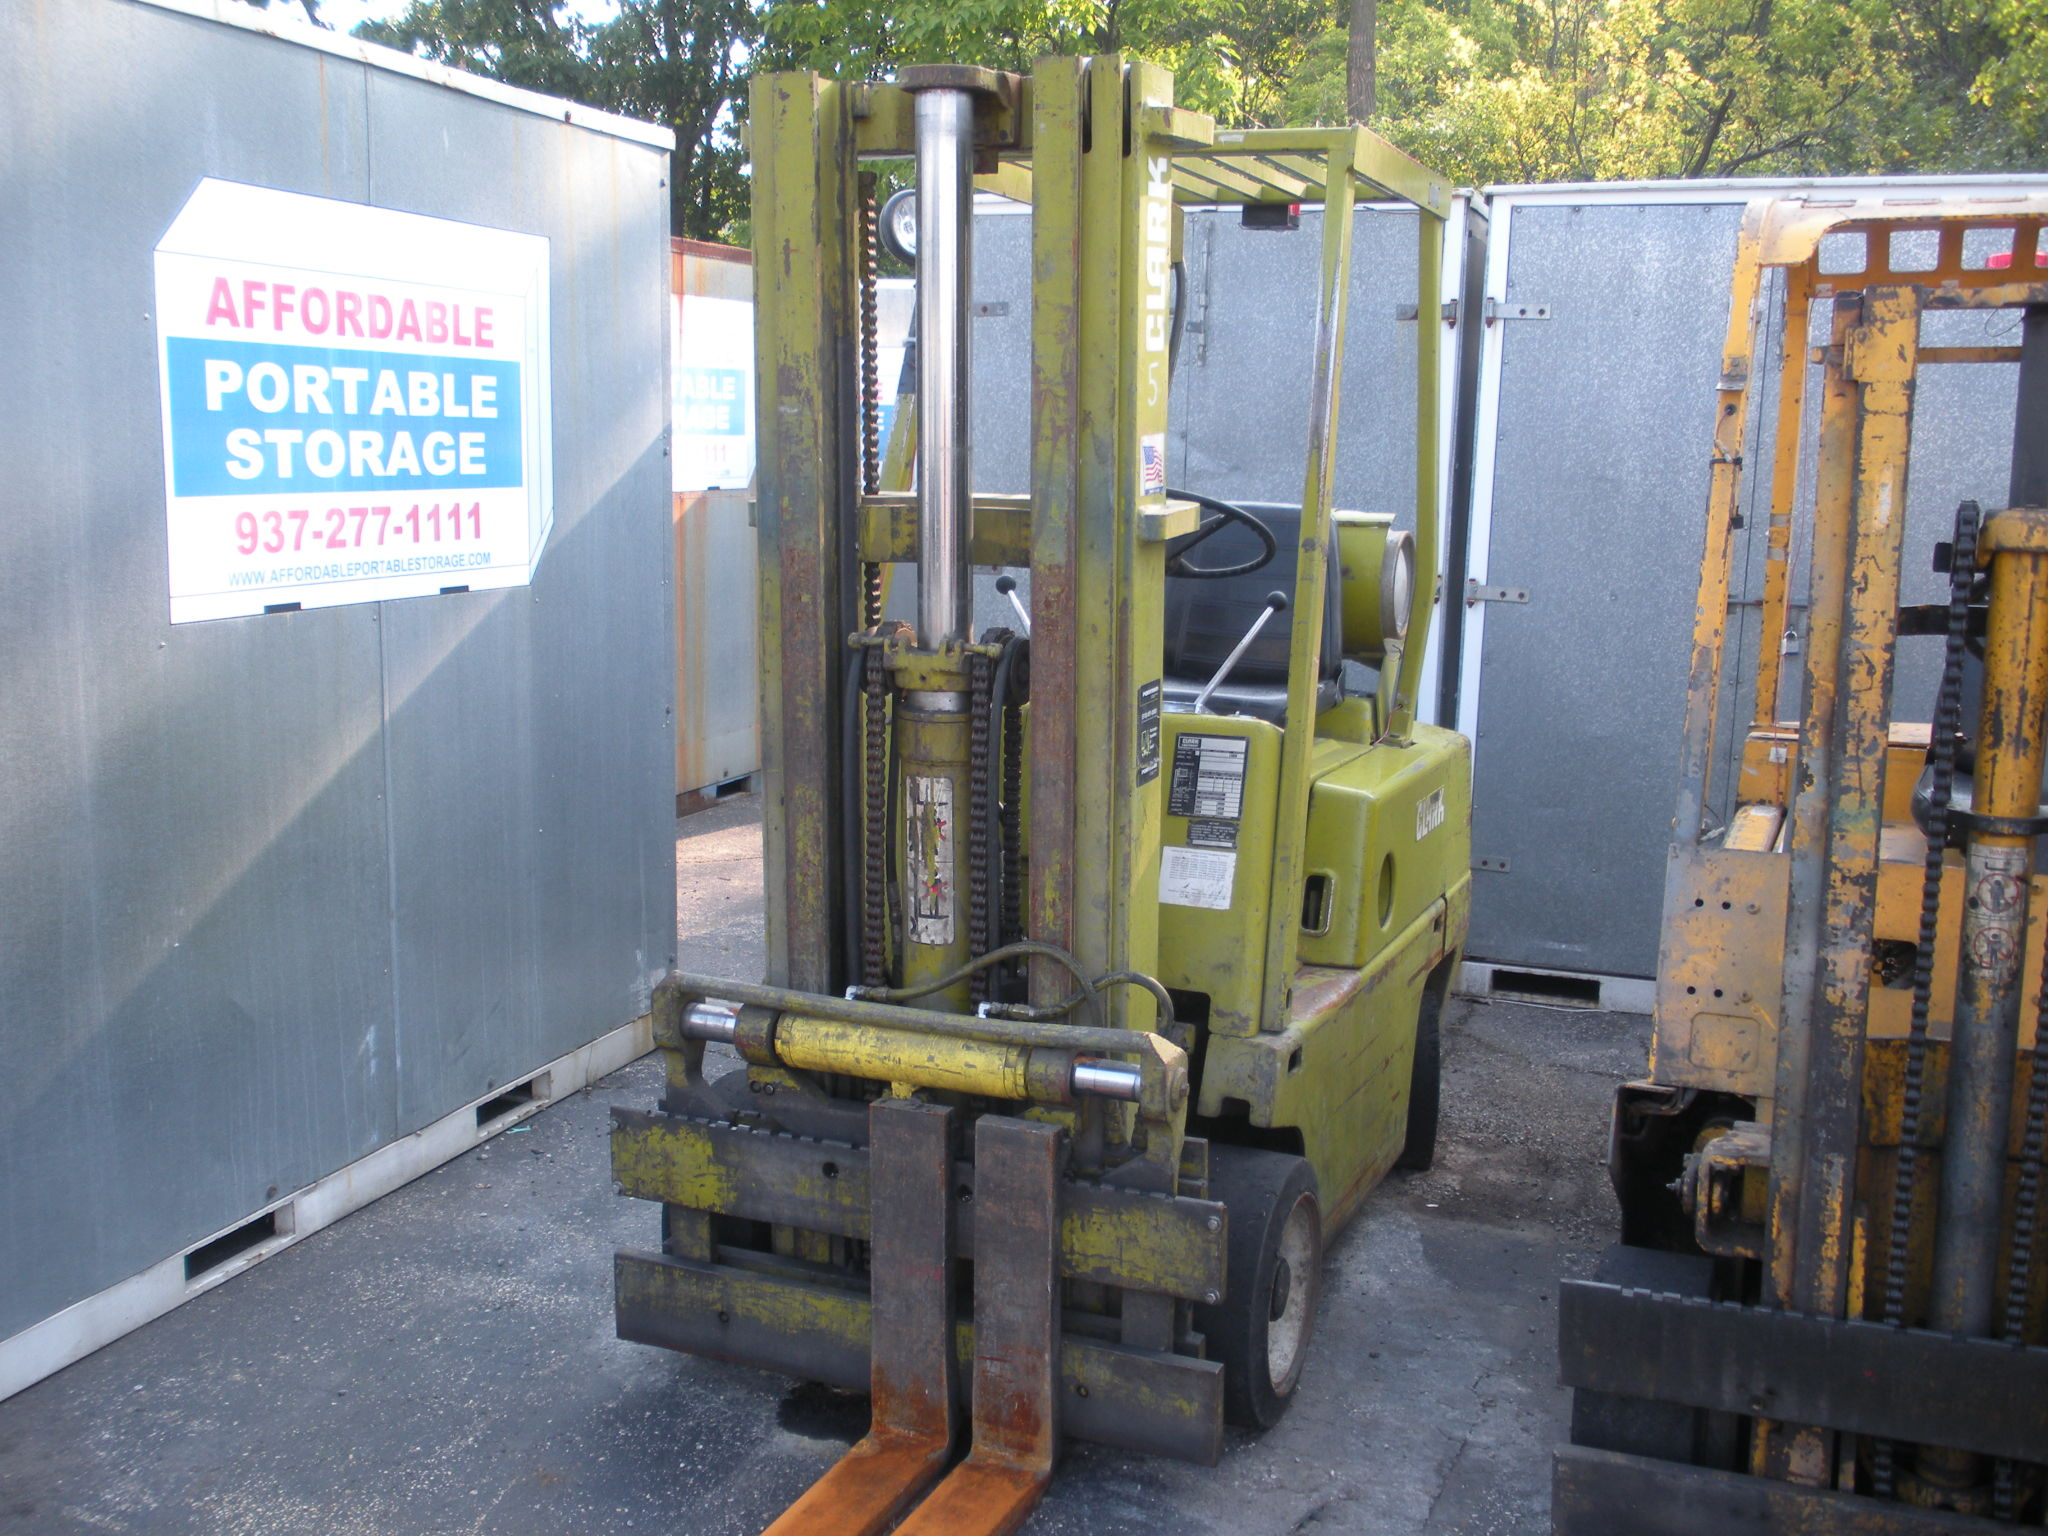 Clark Model 0500 40 LPG 4,000# Lift Truck - Details Pending